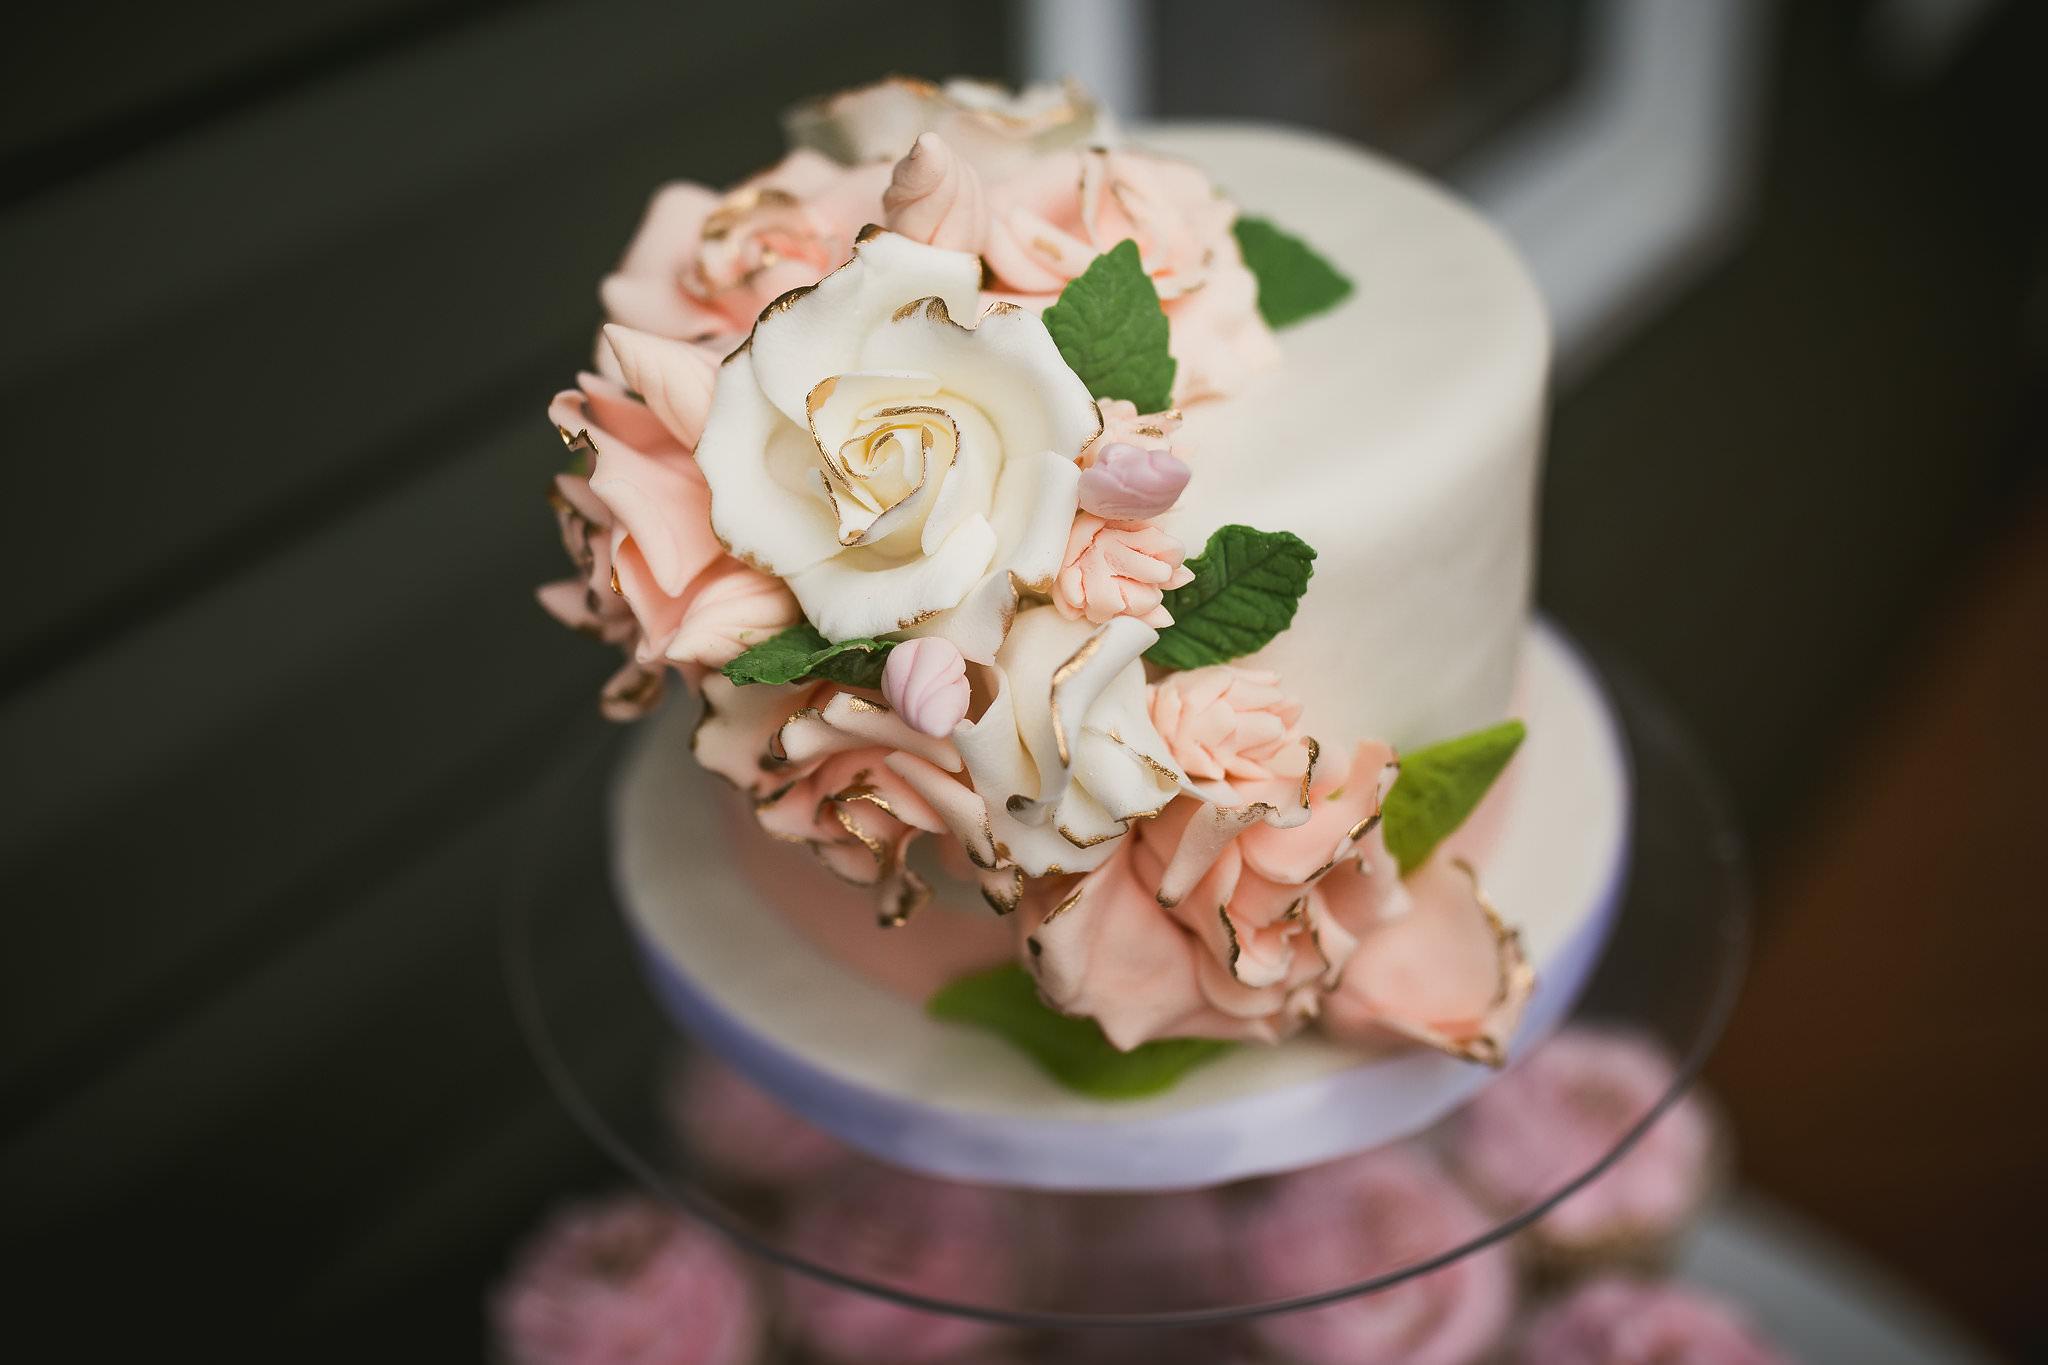 Kristen Adam Kindred Loft Whitby Wedding Photos 91 - Durham Wedding Photographer: Kindred Loft Wedding Photos